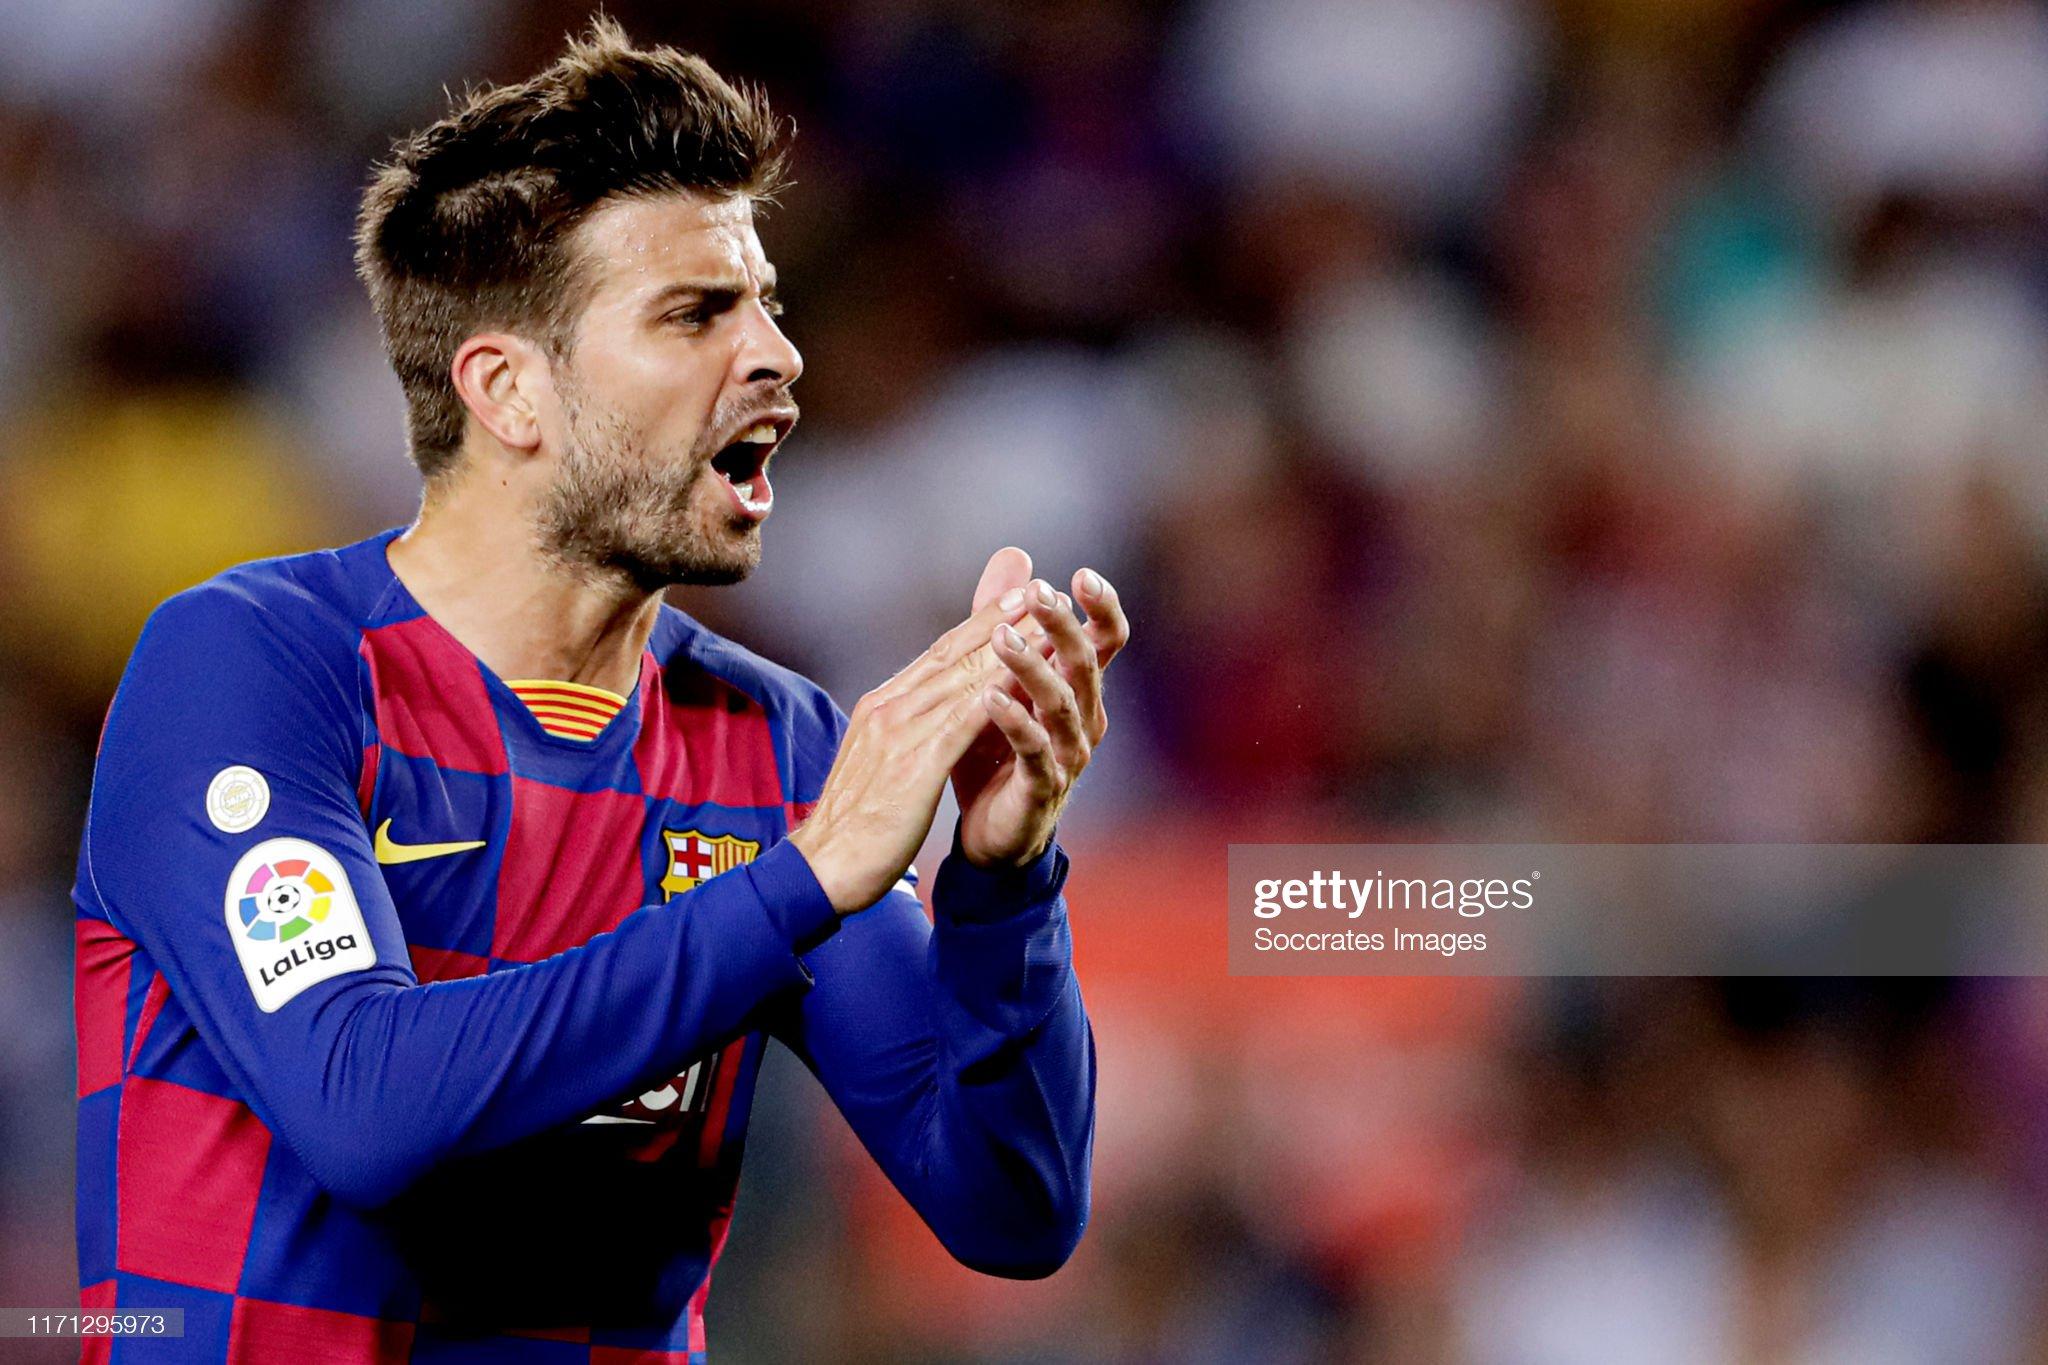 صور مباراة : برشلونة - فياريال 2-1 ( 24-09-2019 )  Gerard-pique-of-fc-barcelona-during-the-la-liga-santander-match-fc-picture-id1171295973?s=2048x2048